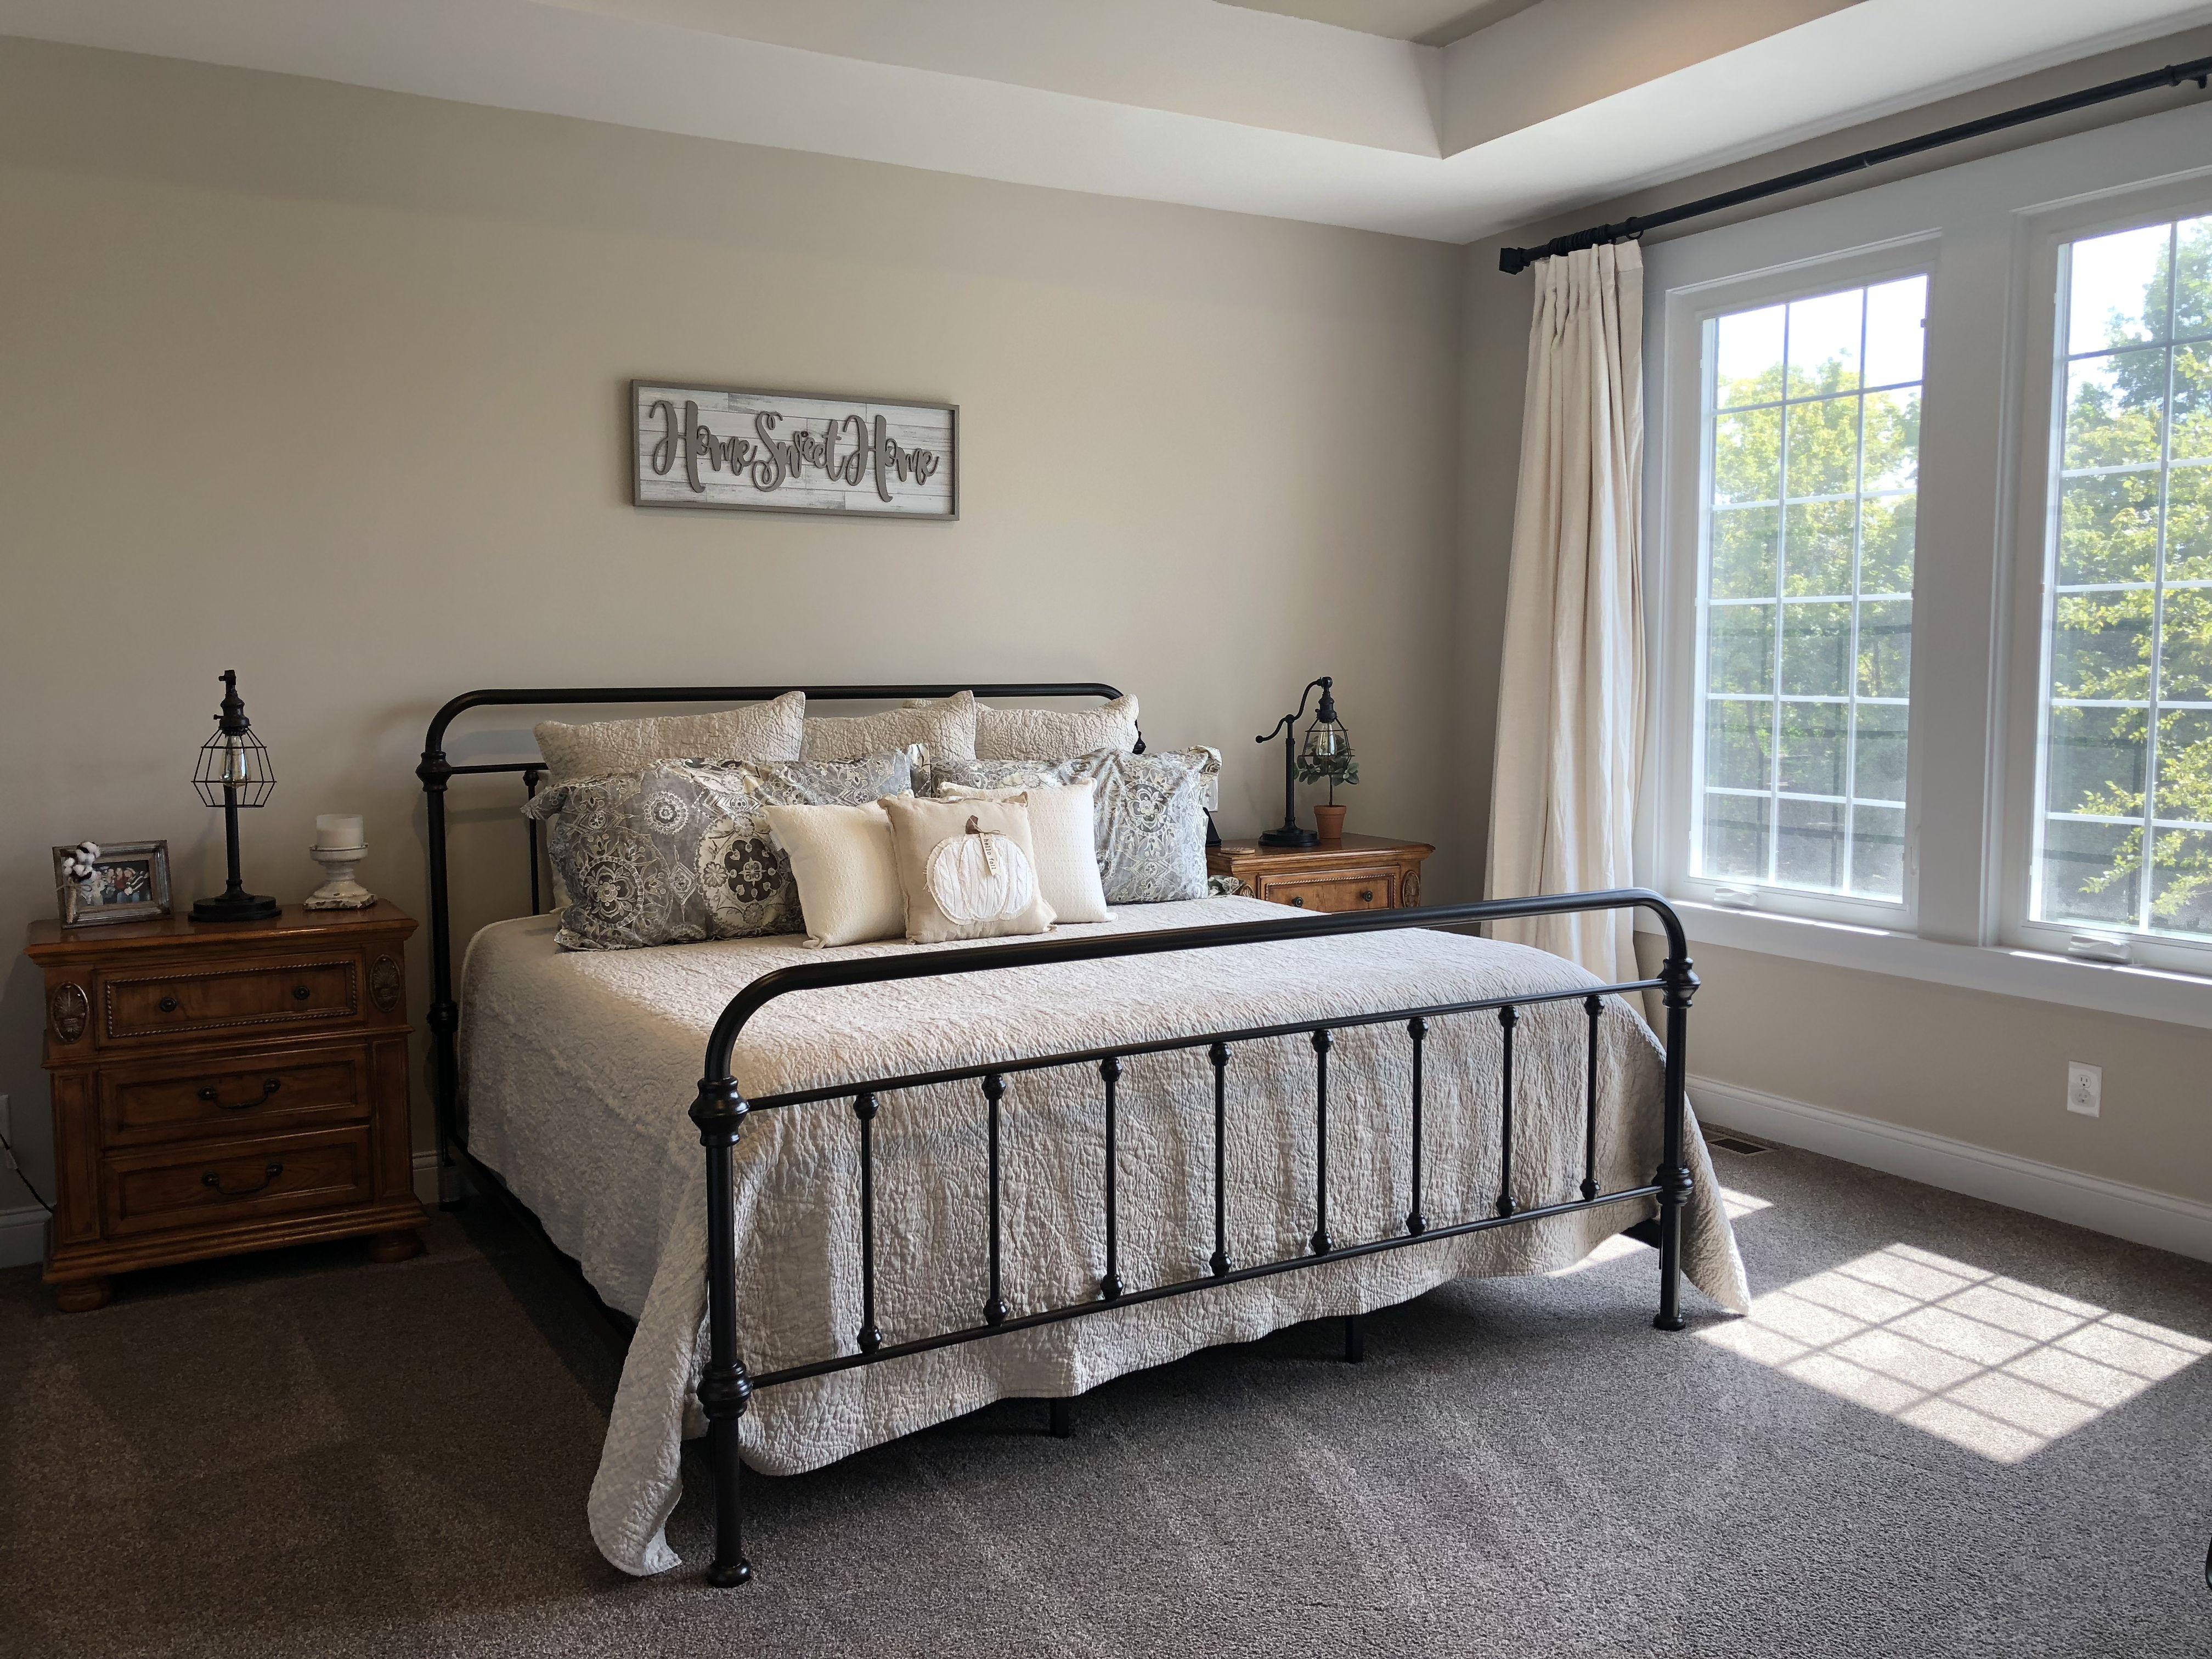 Farmhouse bed and Pottery Barn bedding. Home decor